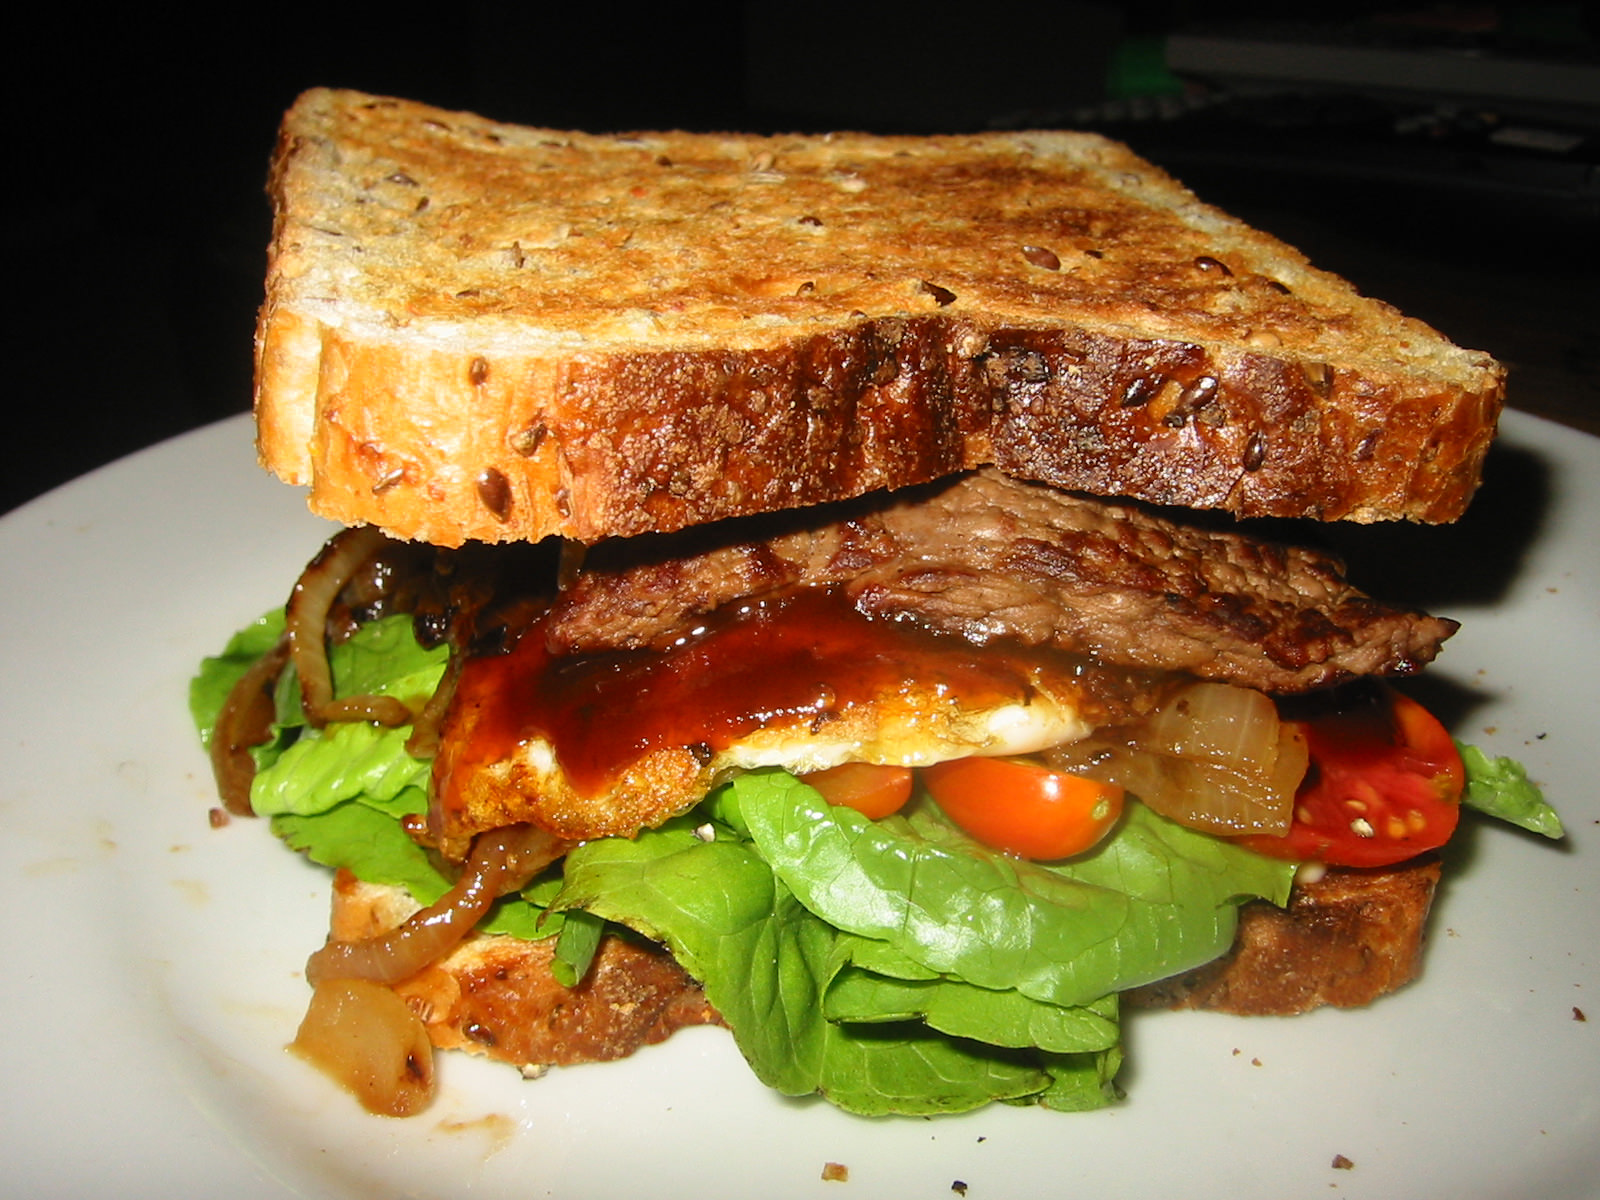 My steak sandwich